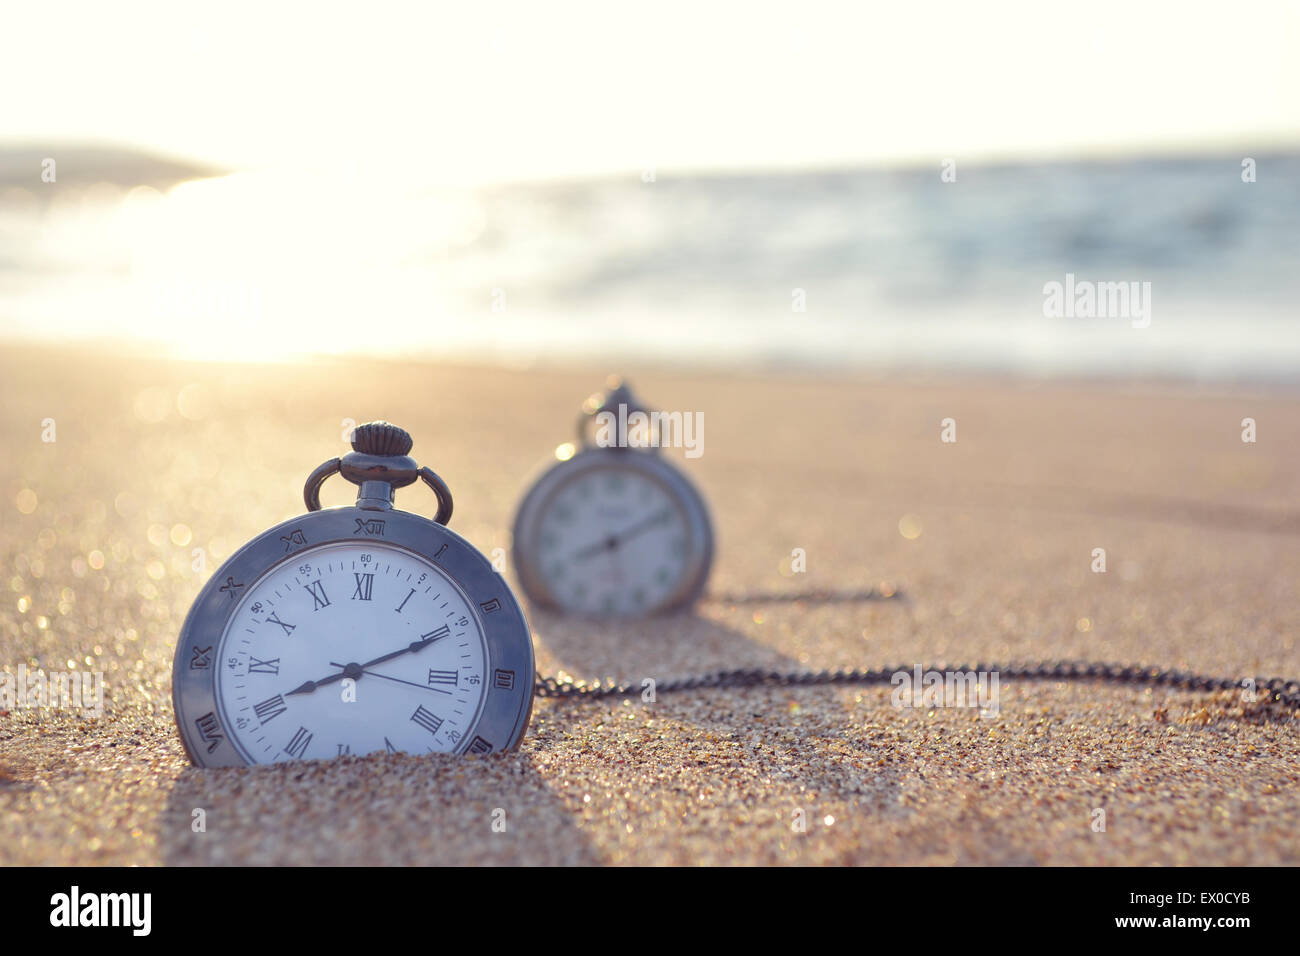 reloj de tiempo Imagen De Stock